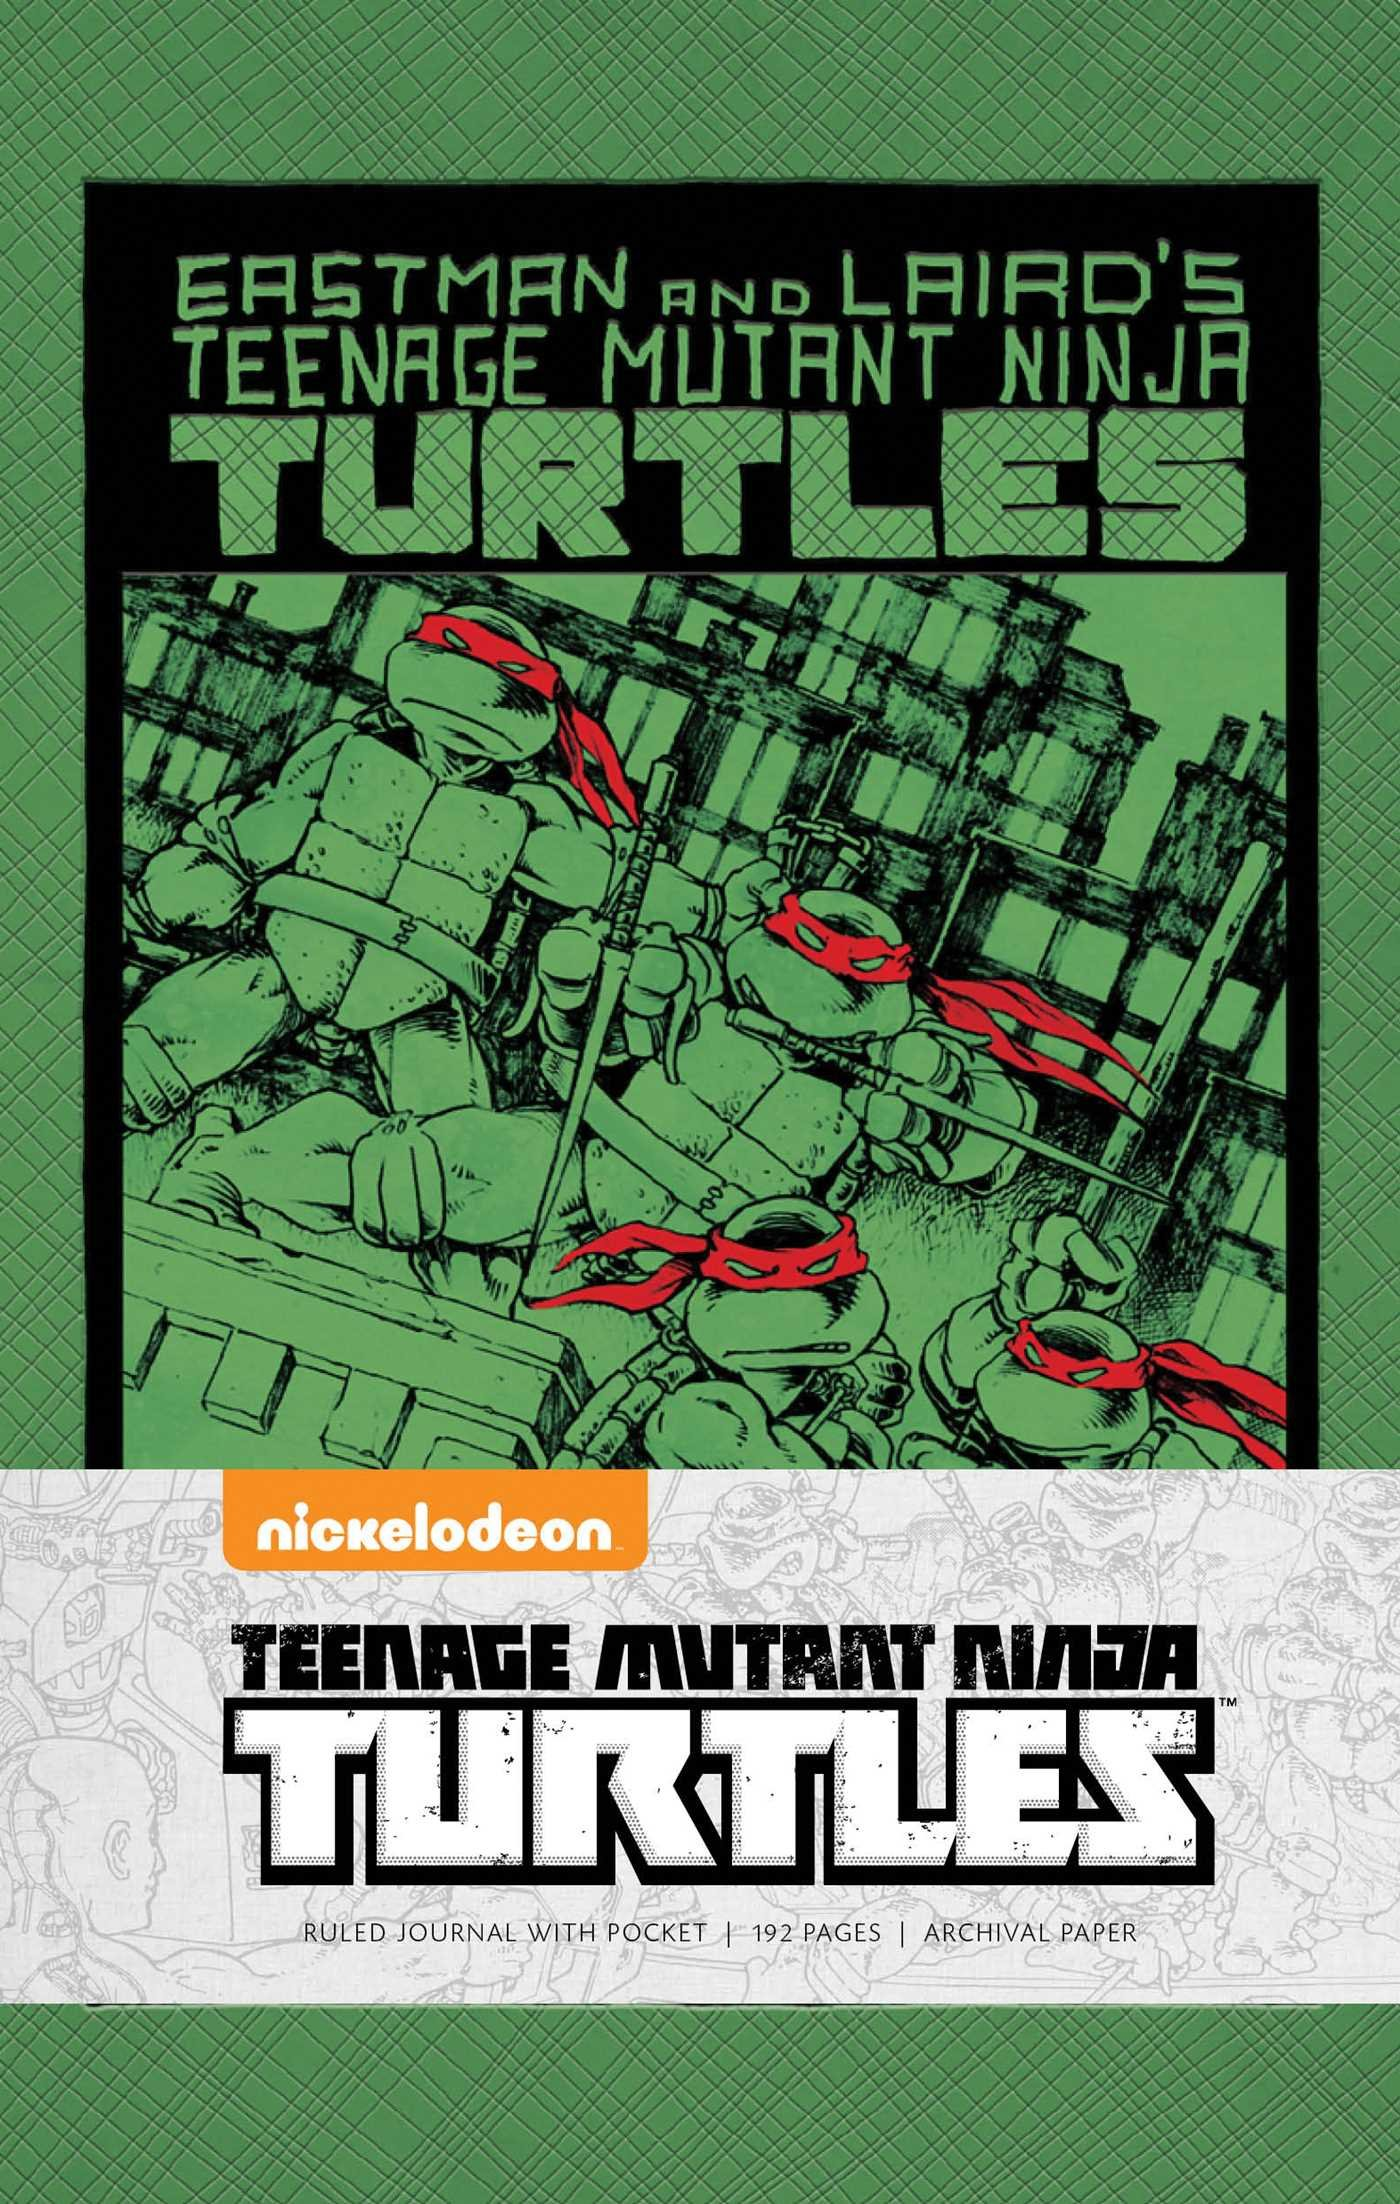 teenage mutant ninja turtles classic hardcover ruled journal insights journals